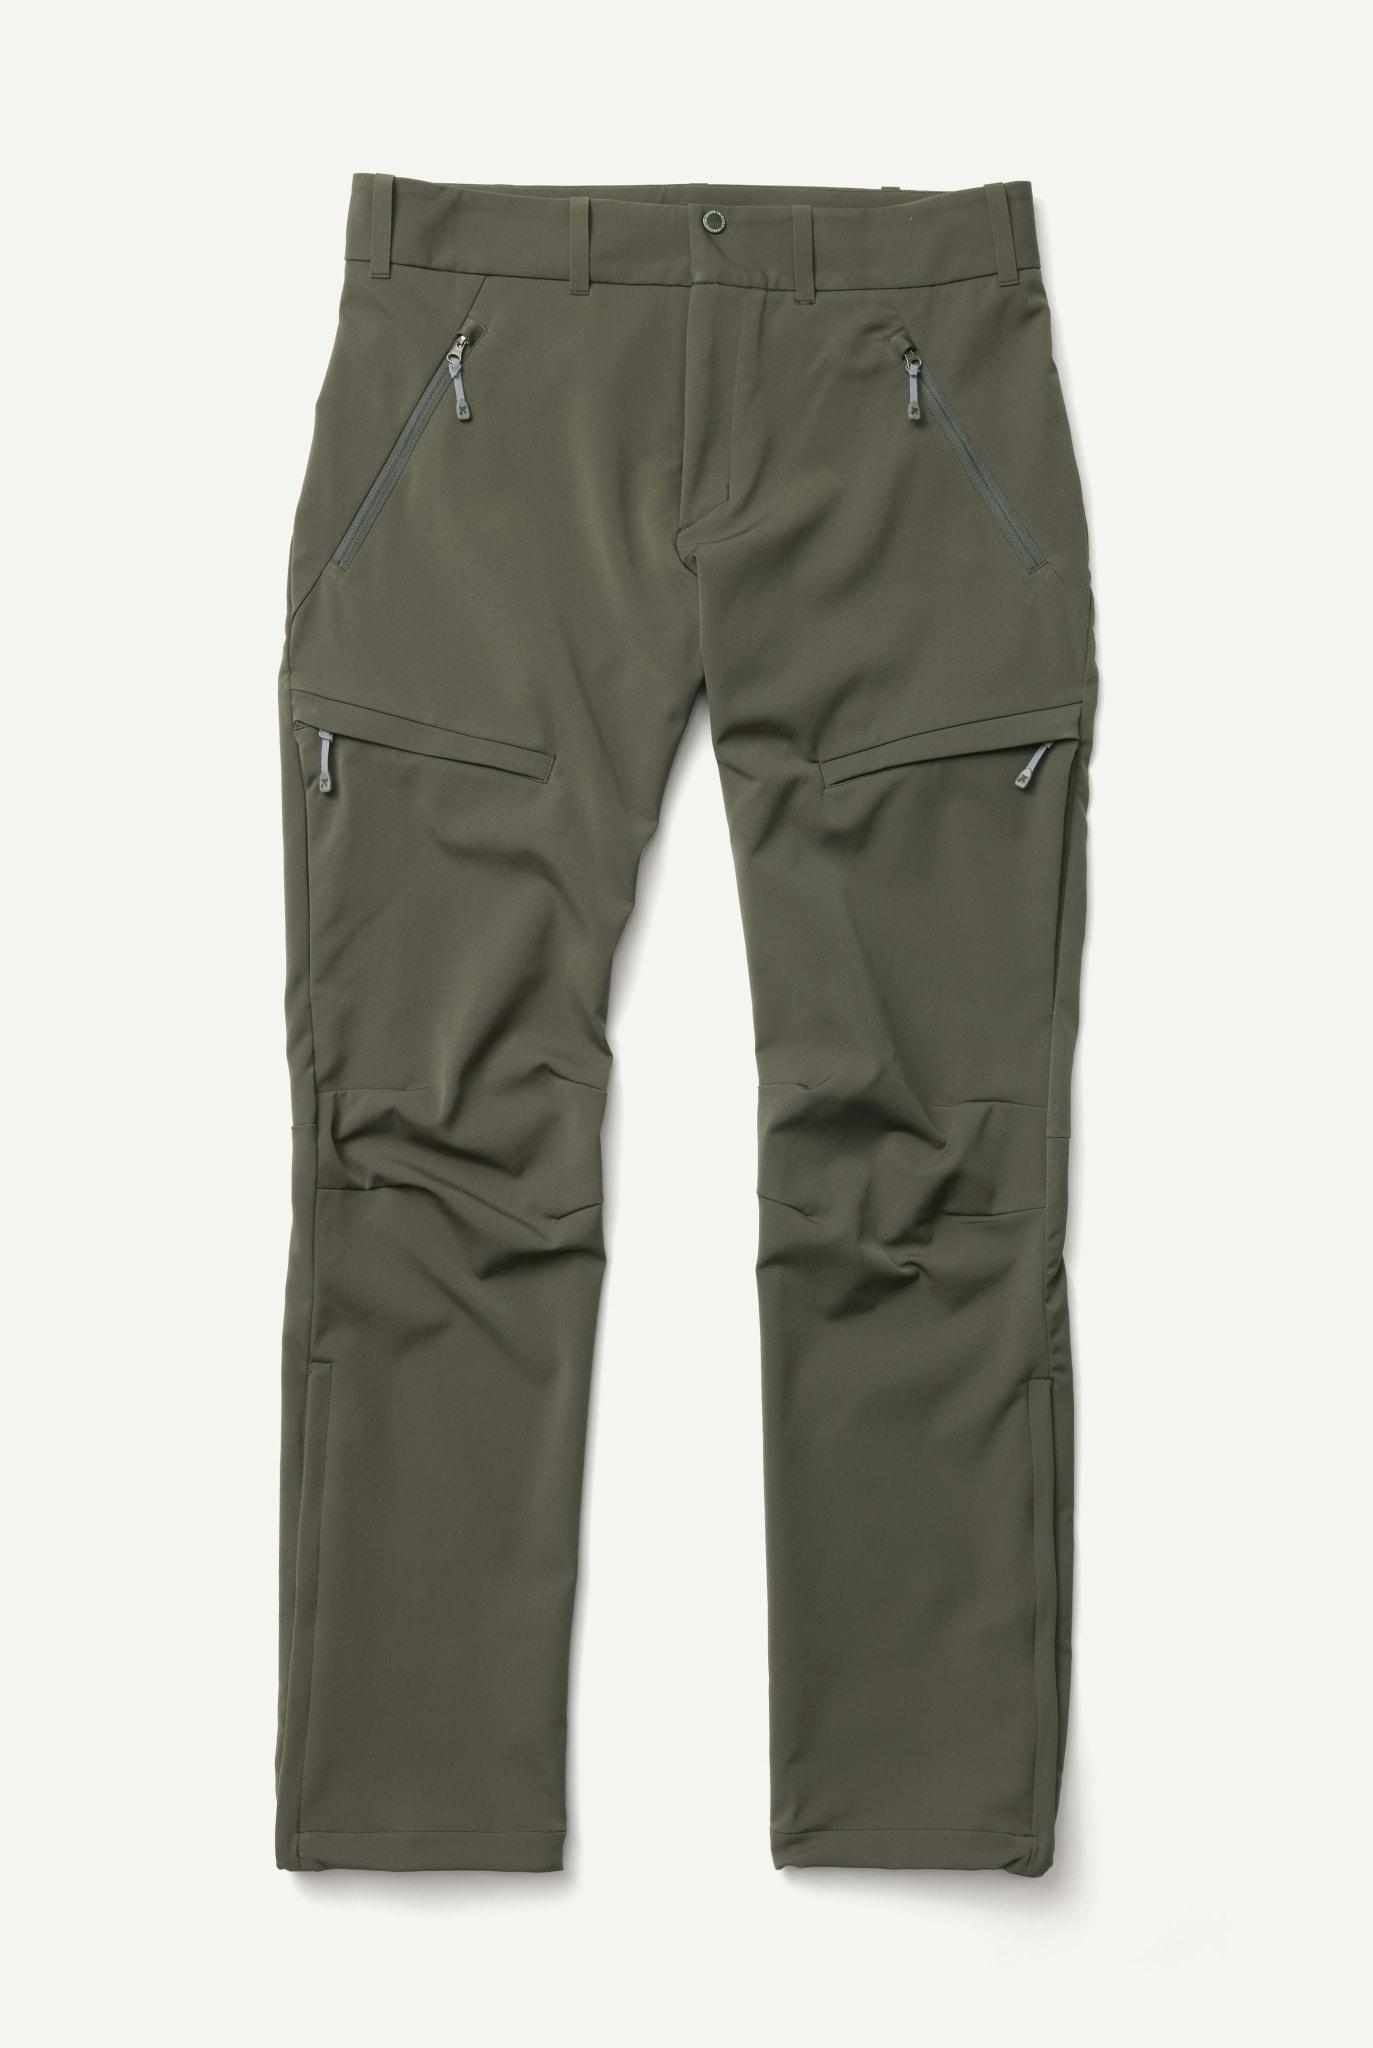 Motion Top Pants Ms